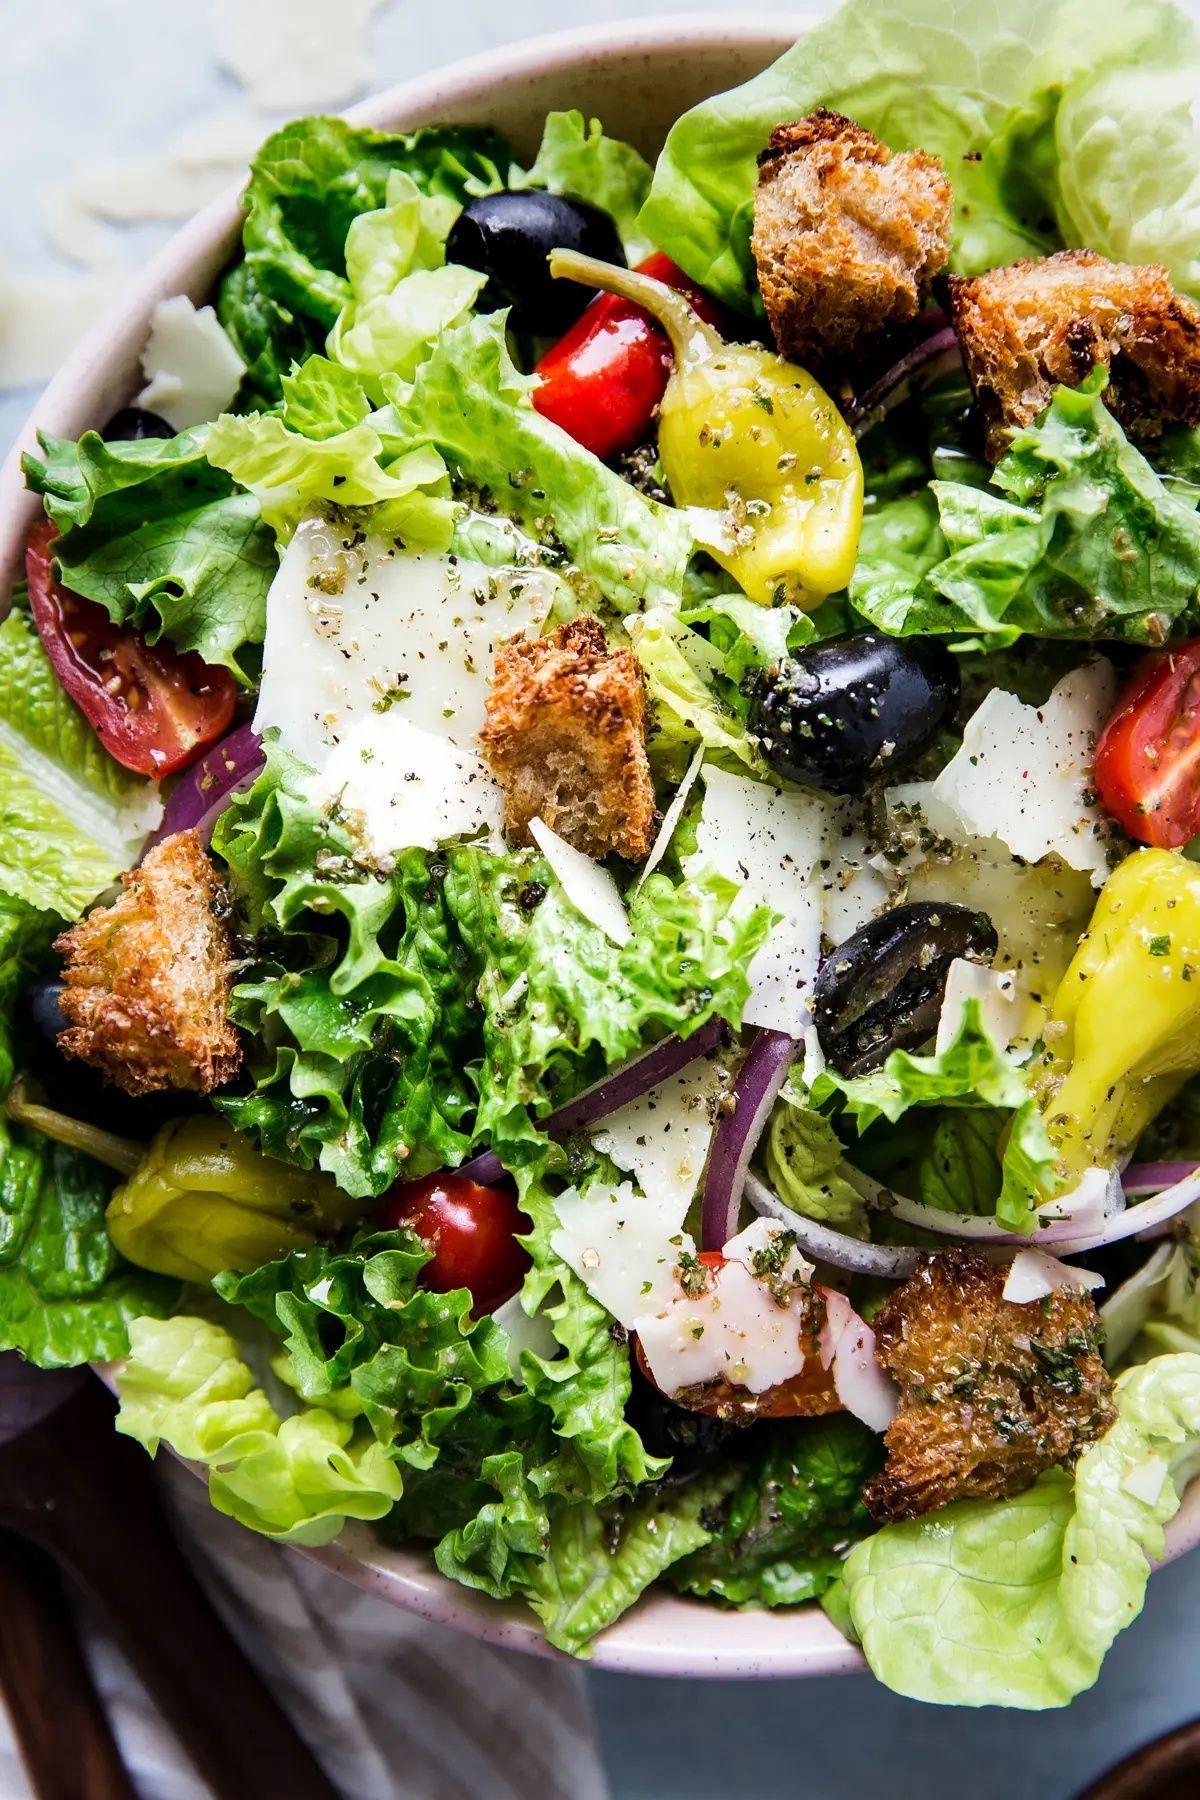 Simple Italian Salad The Modern Proper Recipe In 2021 Italian Salad Recipes Italian Salad Garden Salad Recipe